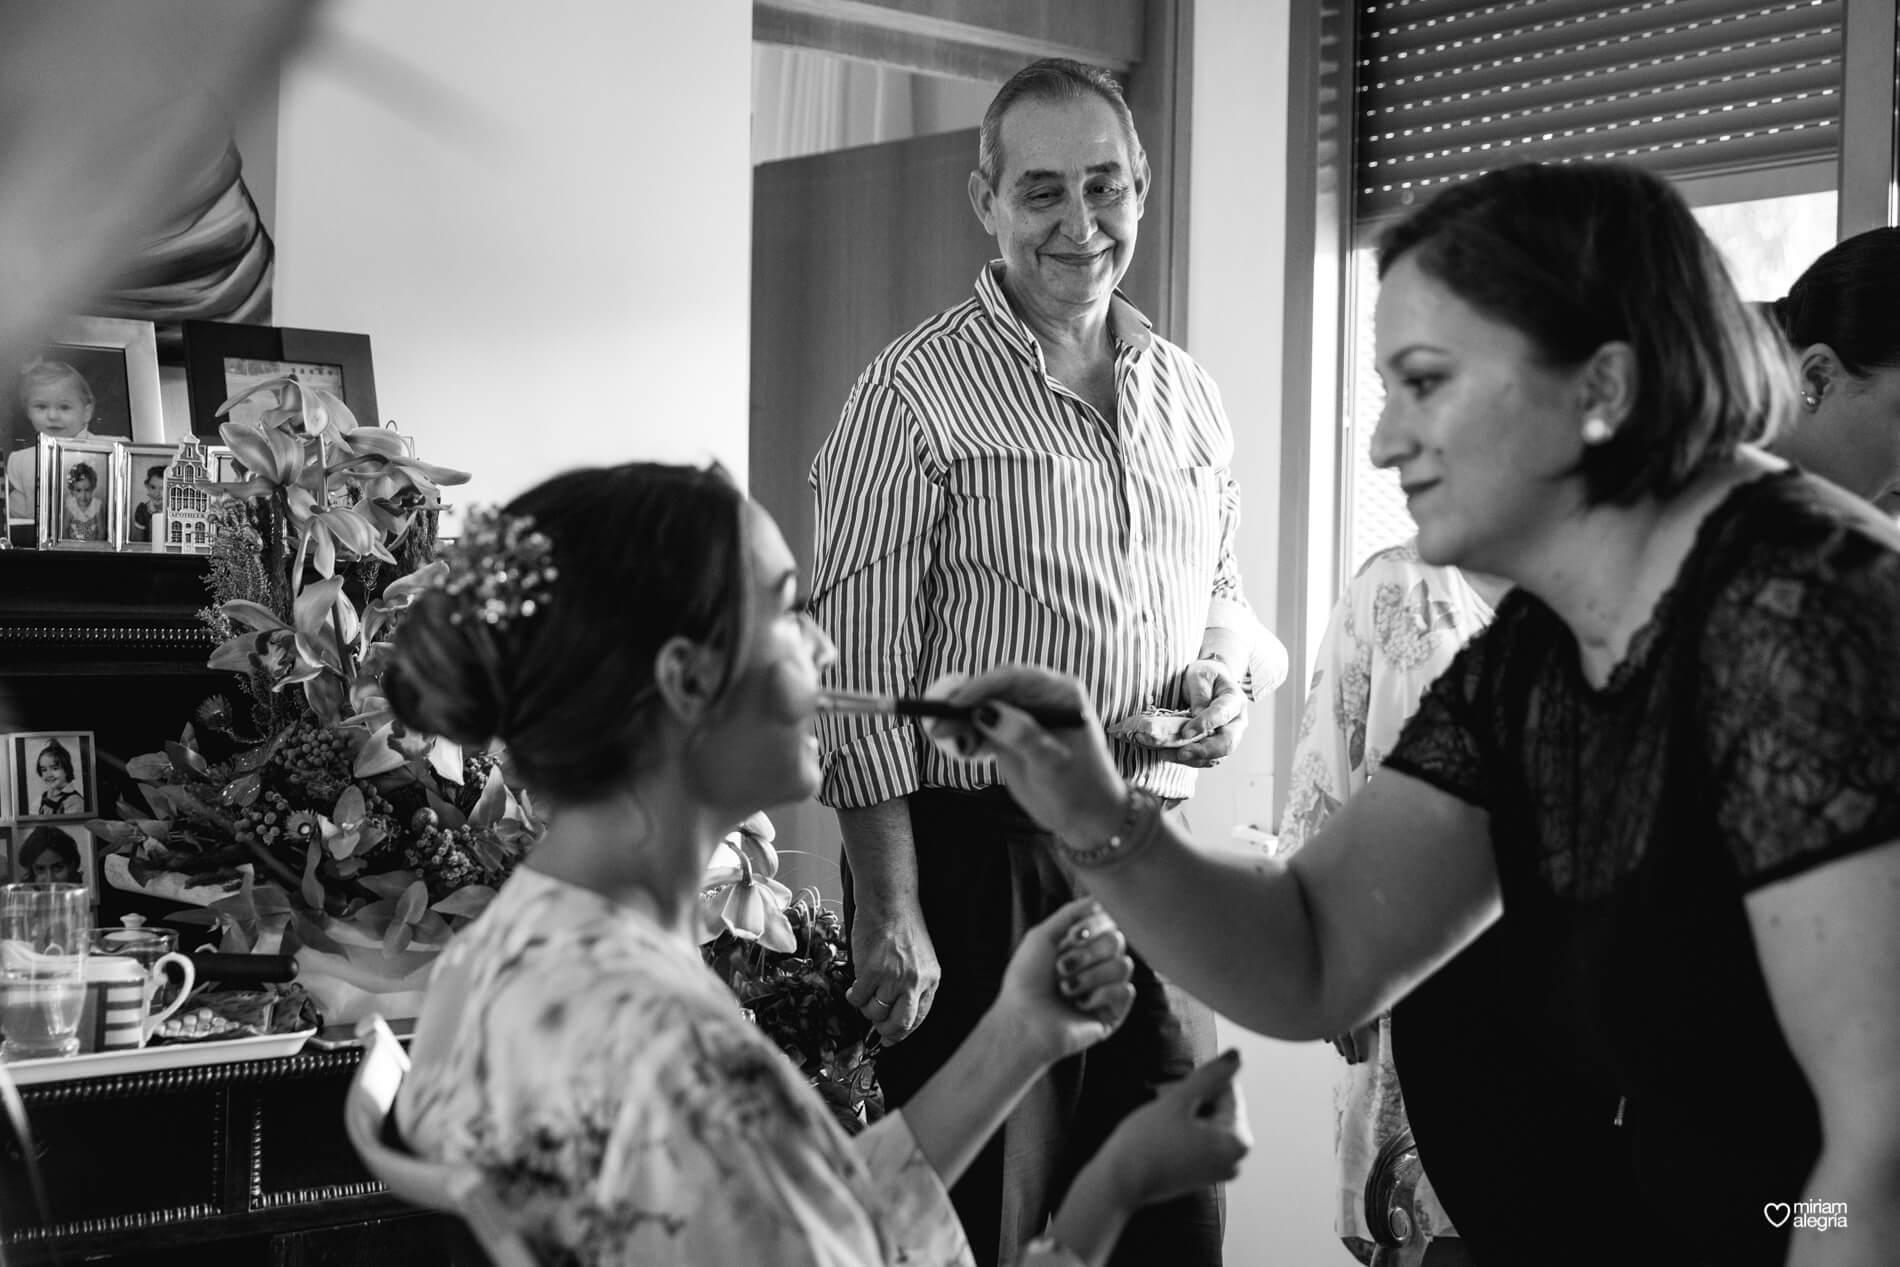 vestido-de-novia-paula-del-vas-miriam-alegria-fotografos-boda-murcia-10